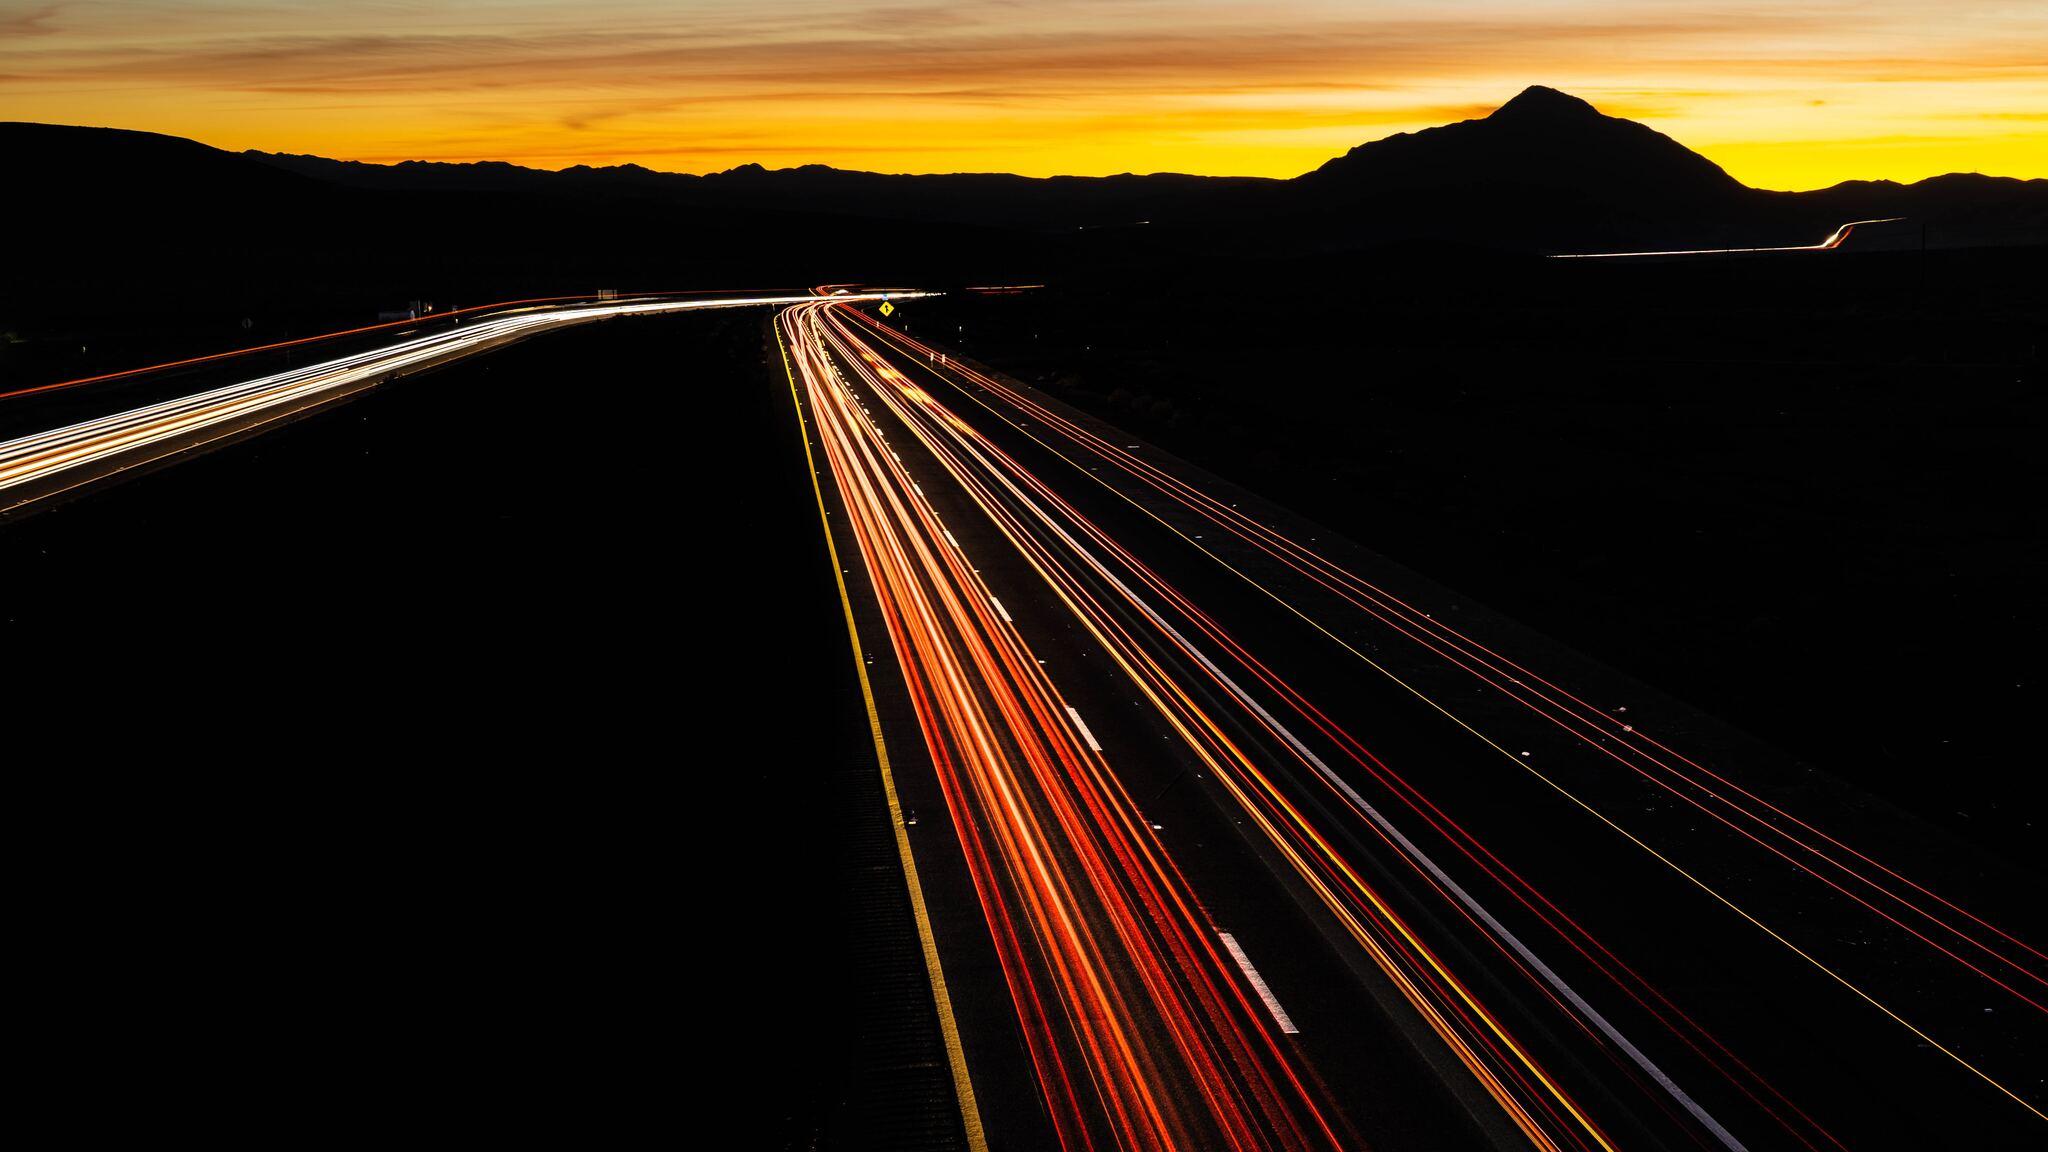 road-turn-backlight-long-exposure-5k-k3.jpg